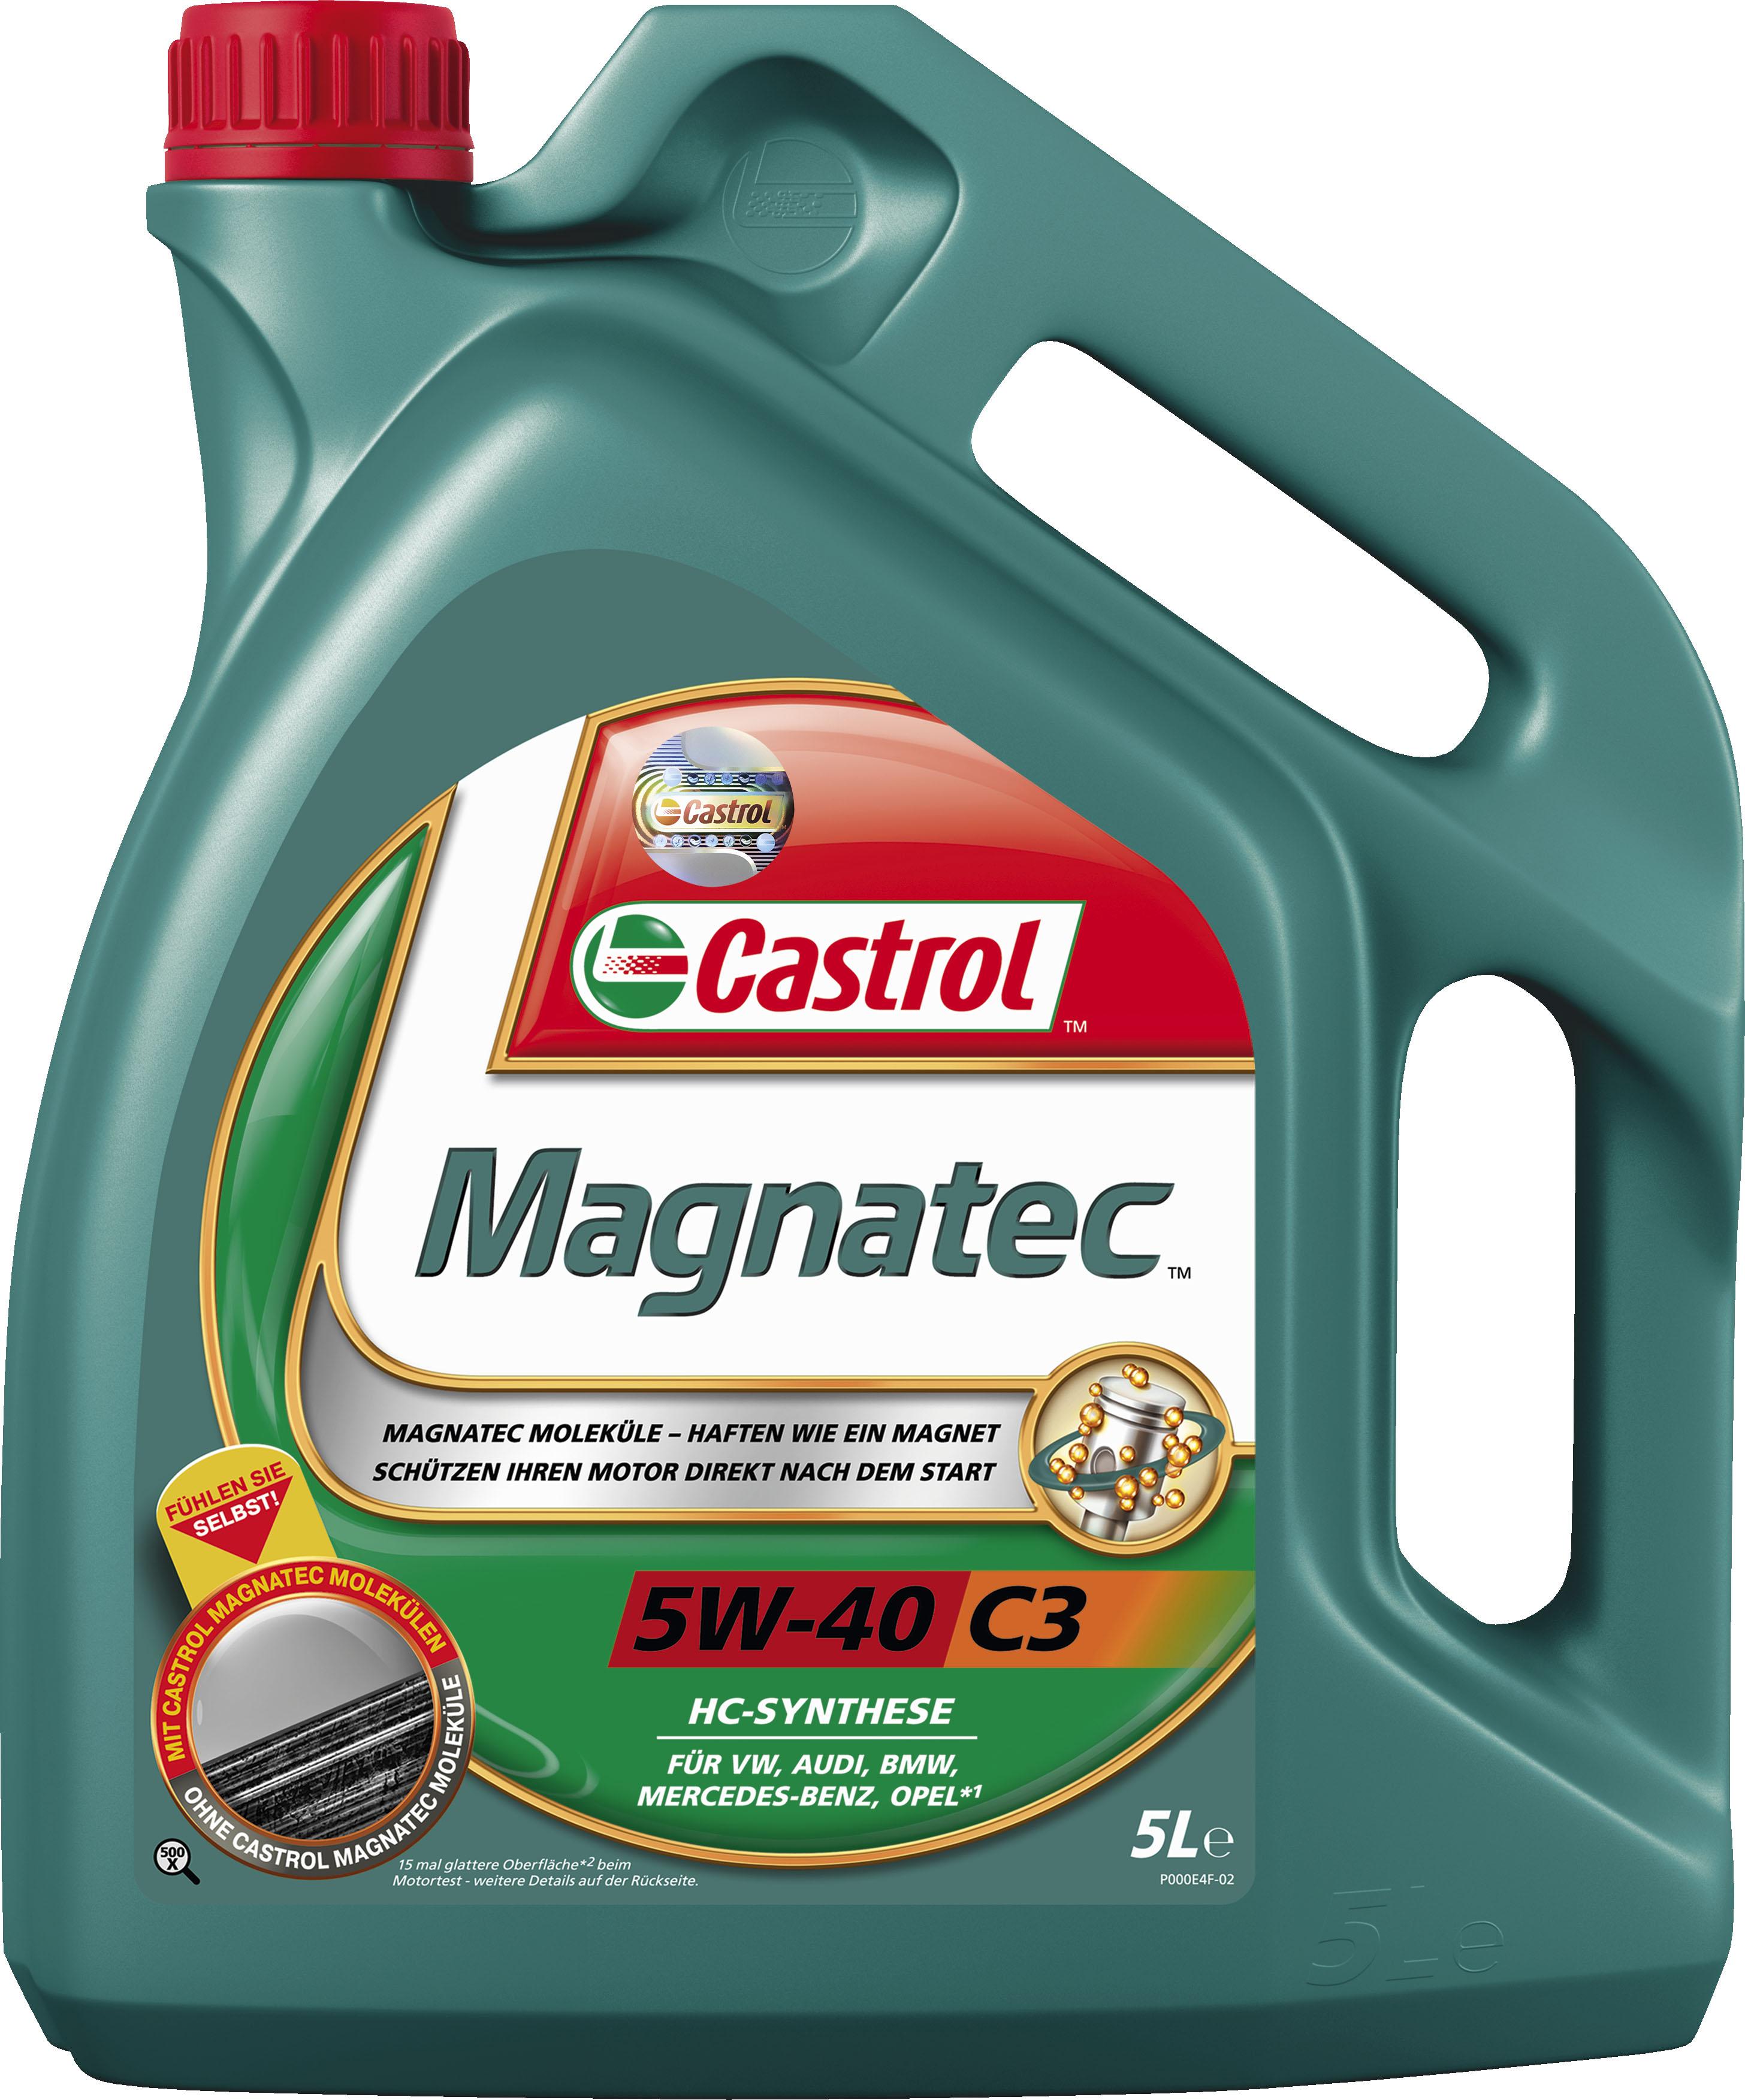 original castrol magnatec 5w 40 c3 5l 5 liter motor l l. Black Bedroom Furniture Sets. Home Design Ideas